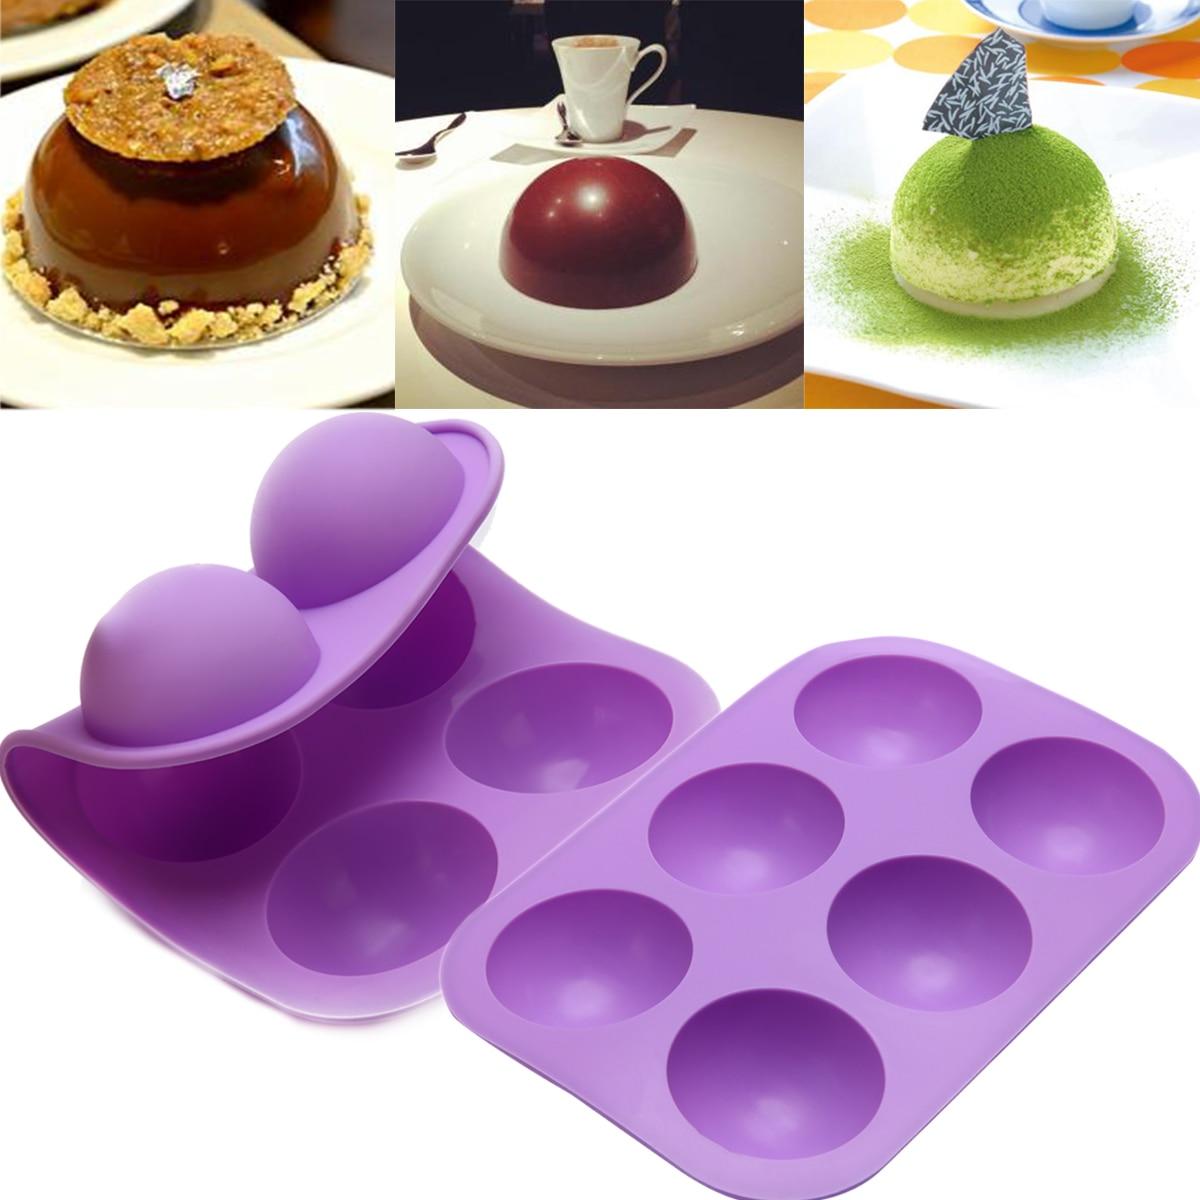 Нов силиконова половина топка сфера - Кухня, трапезария и бар